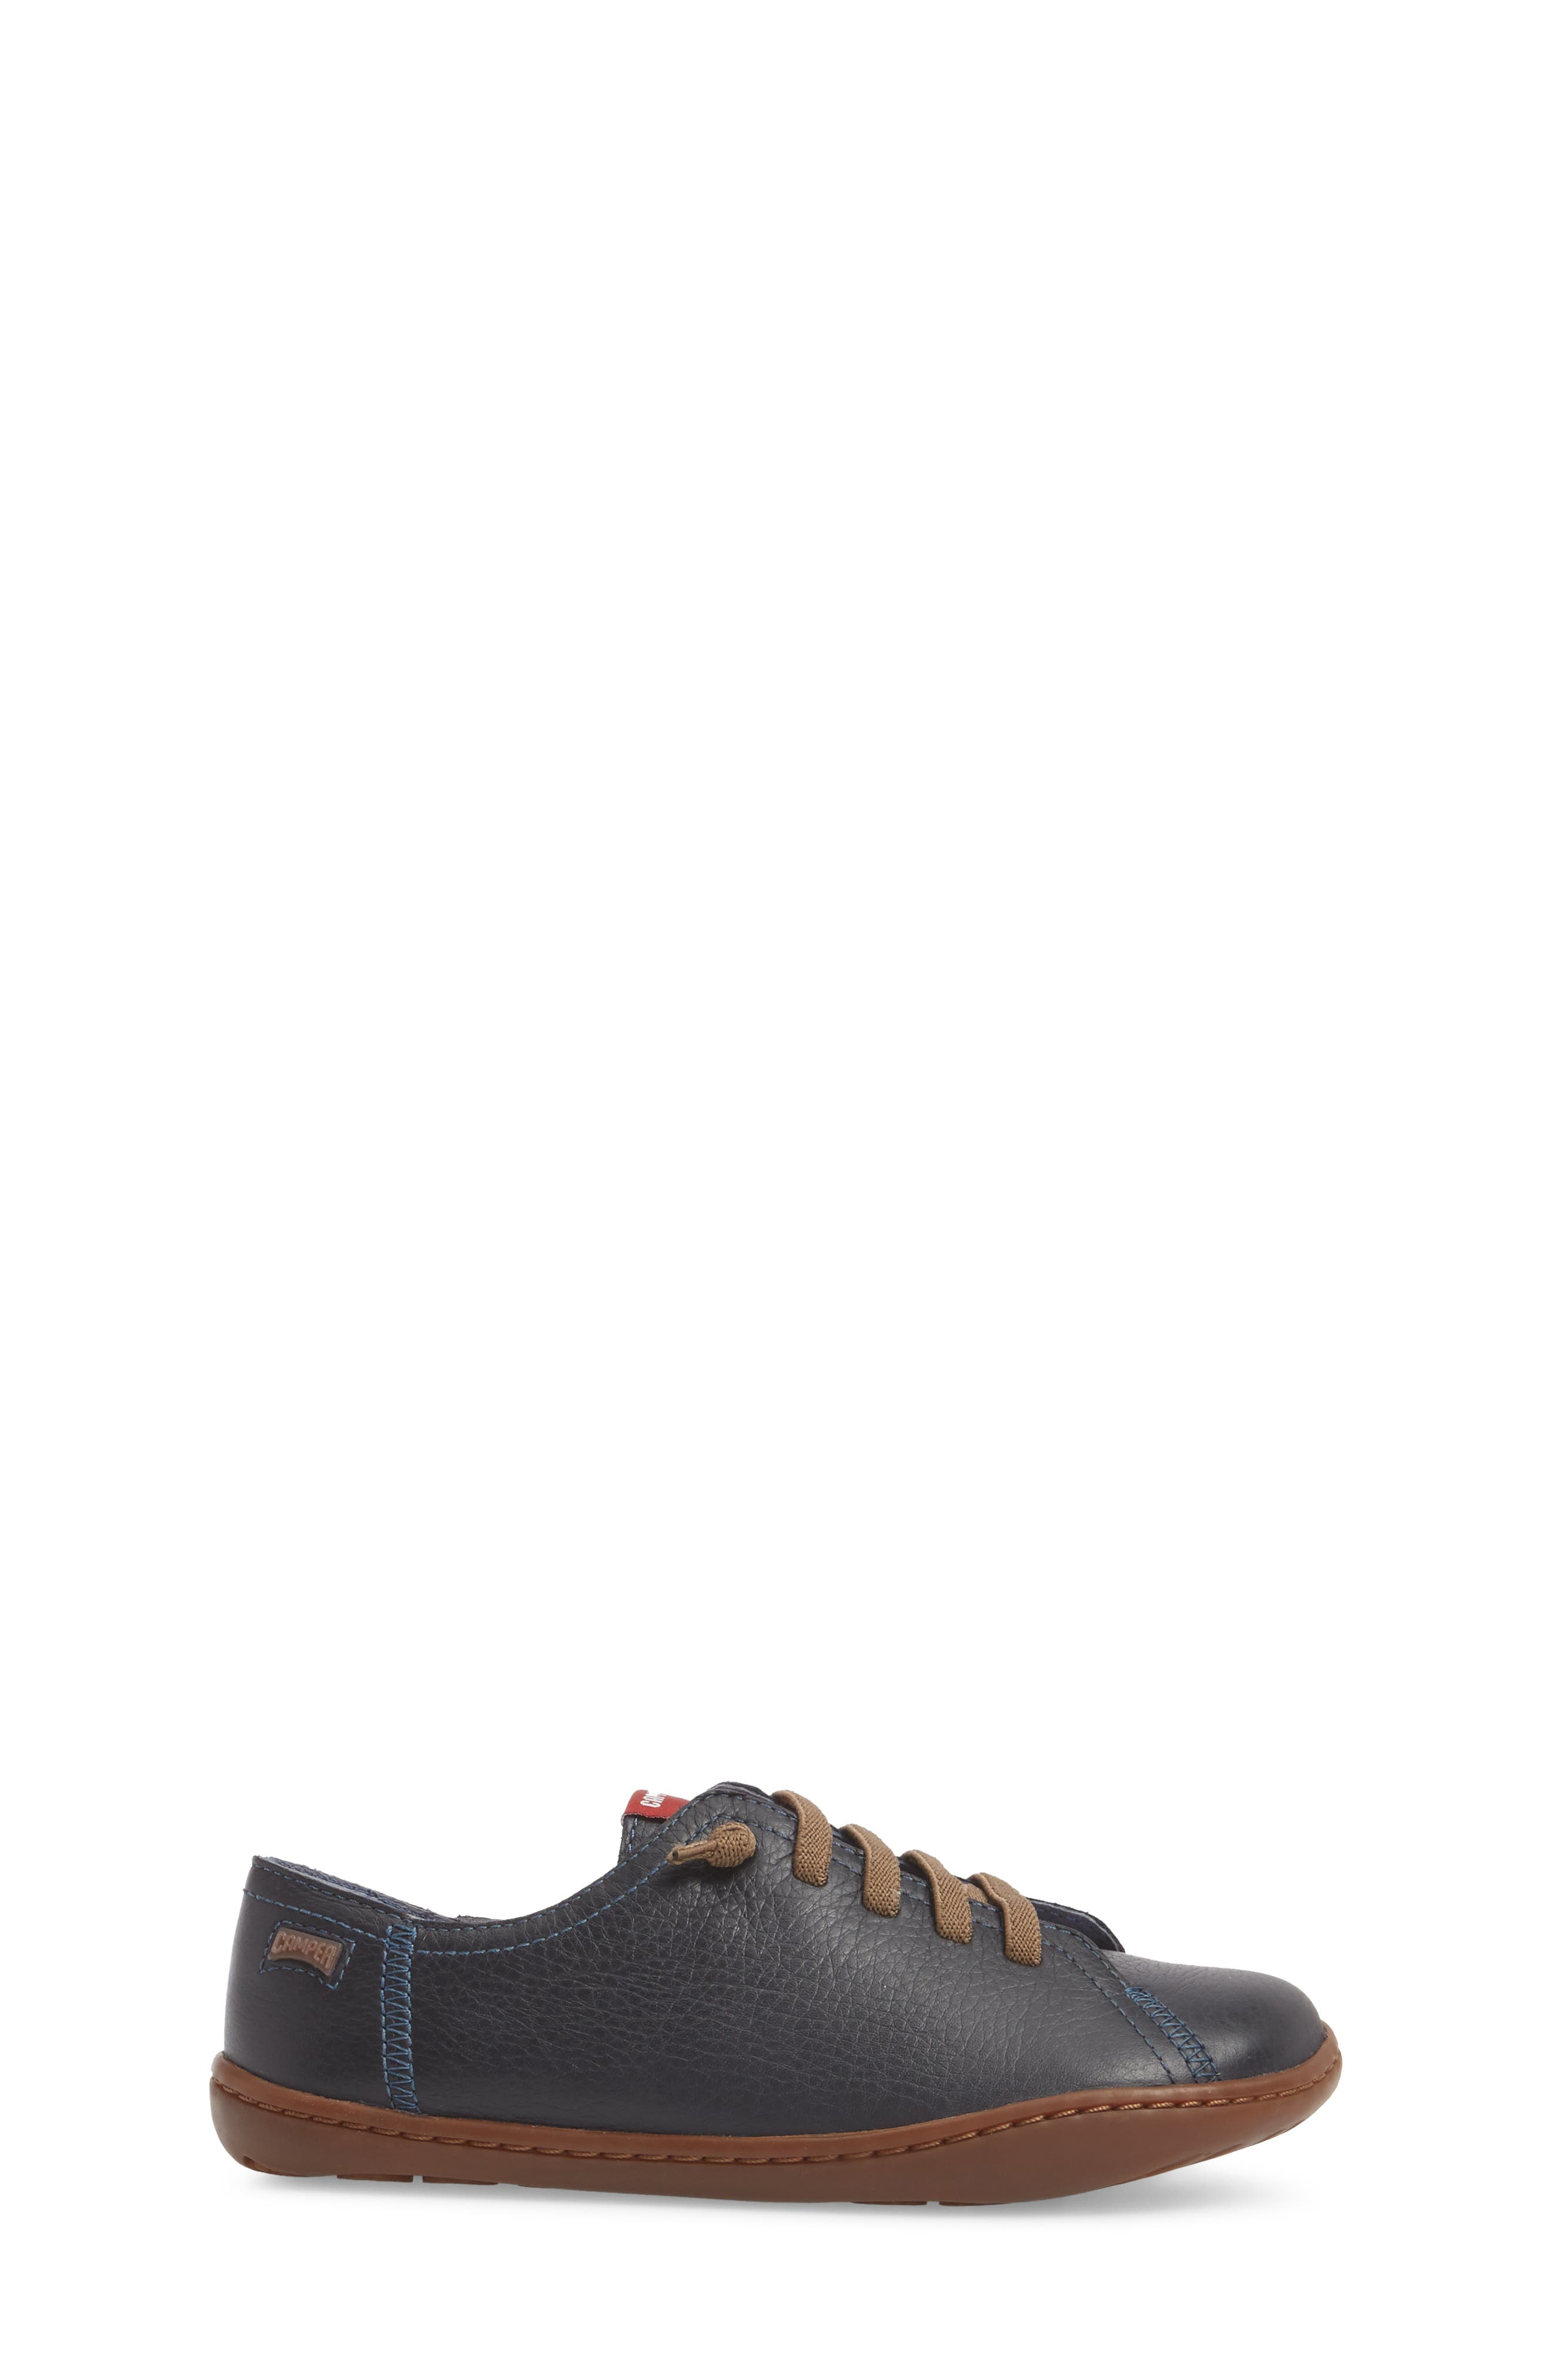 Peu Cami Sneaker,                             Alternate thumbnail 3, color,                             Blue